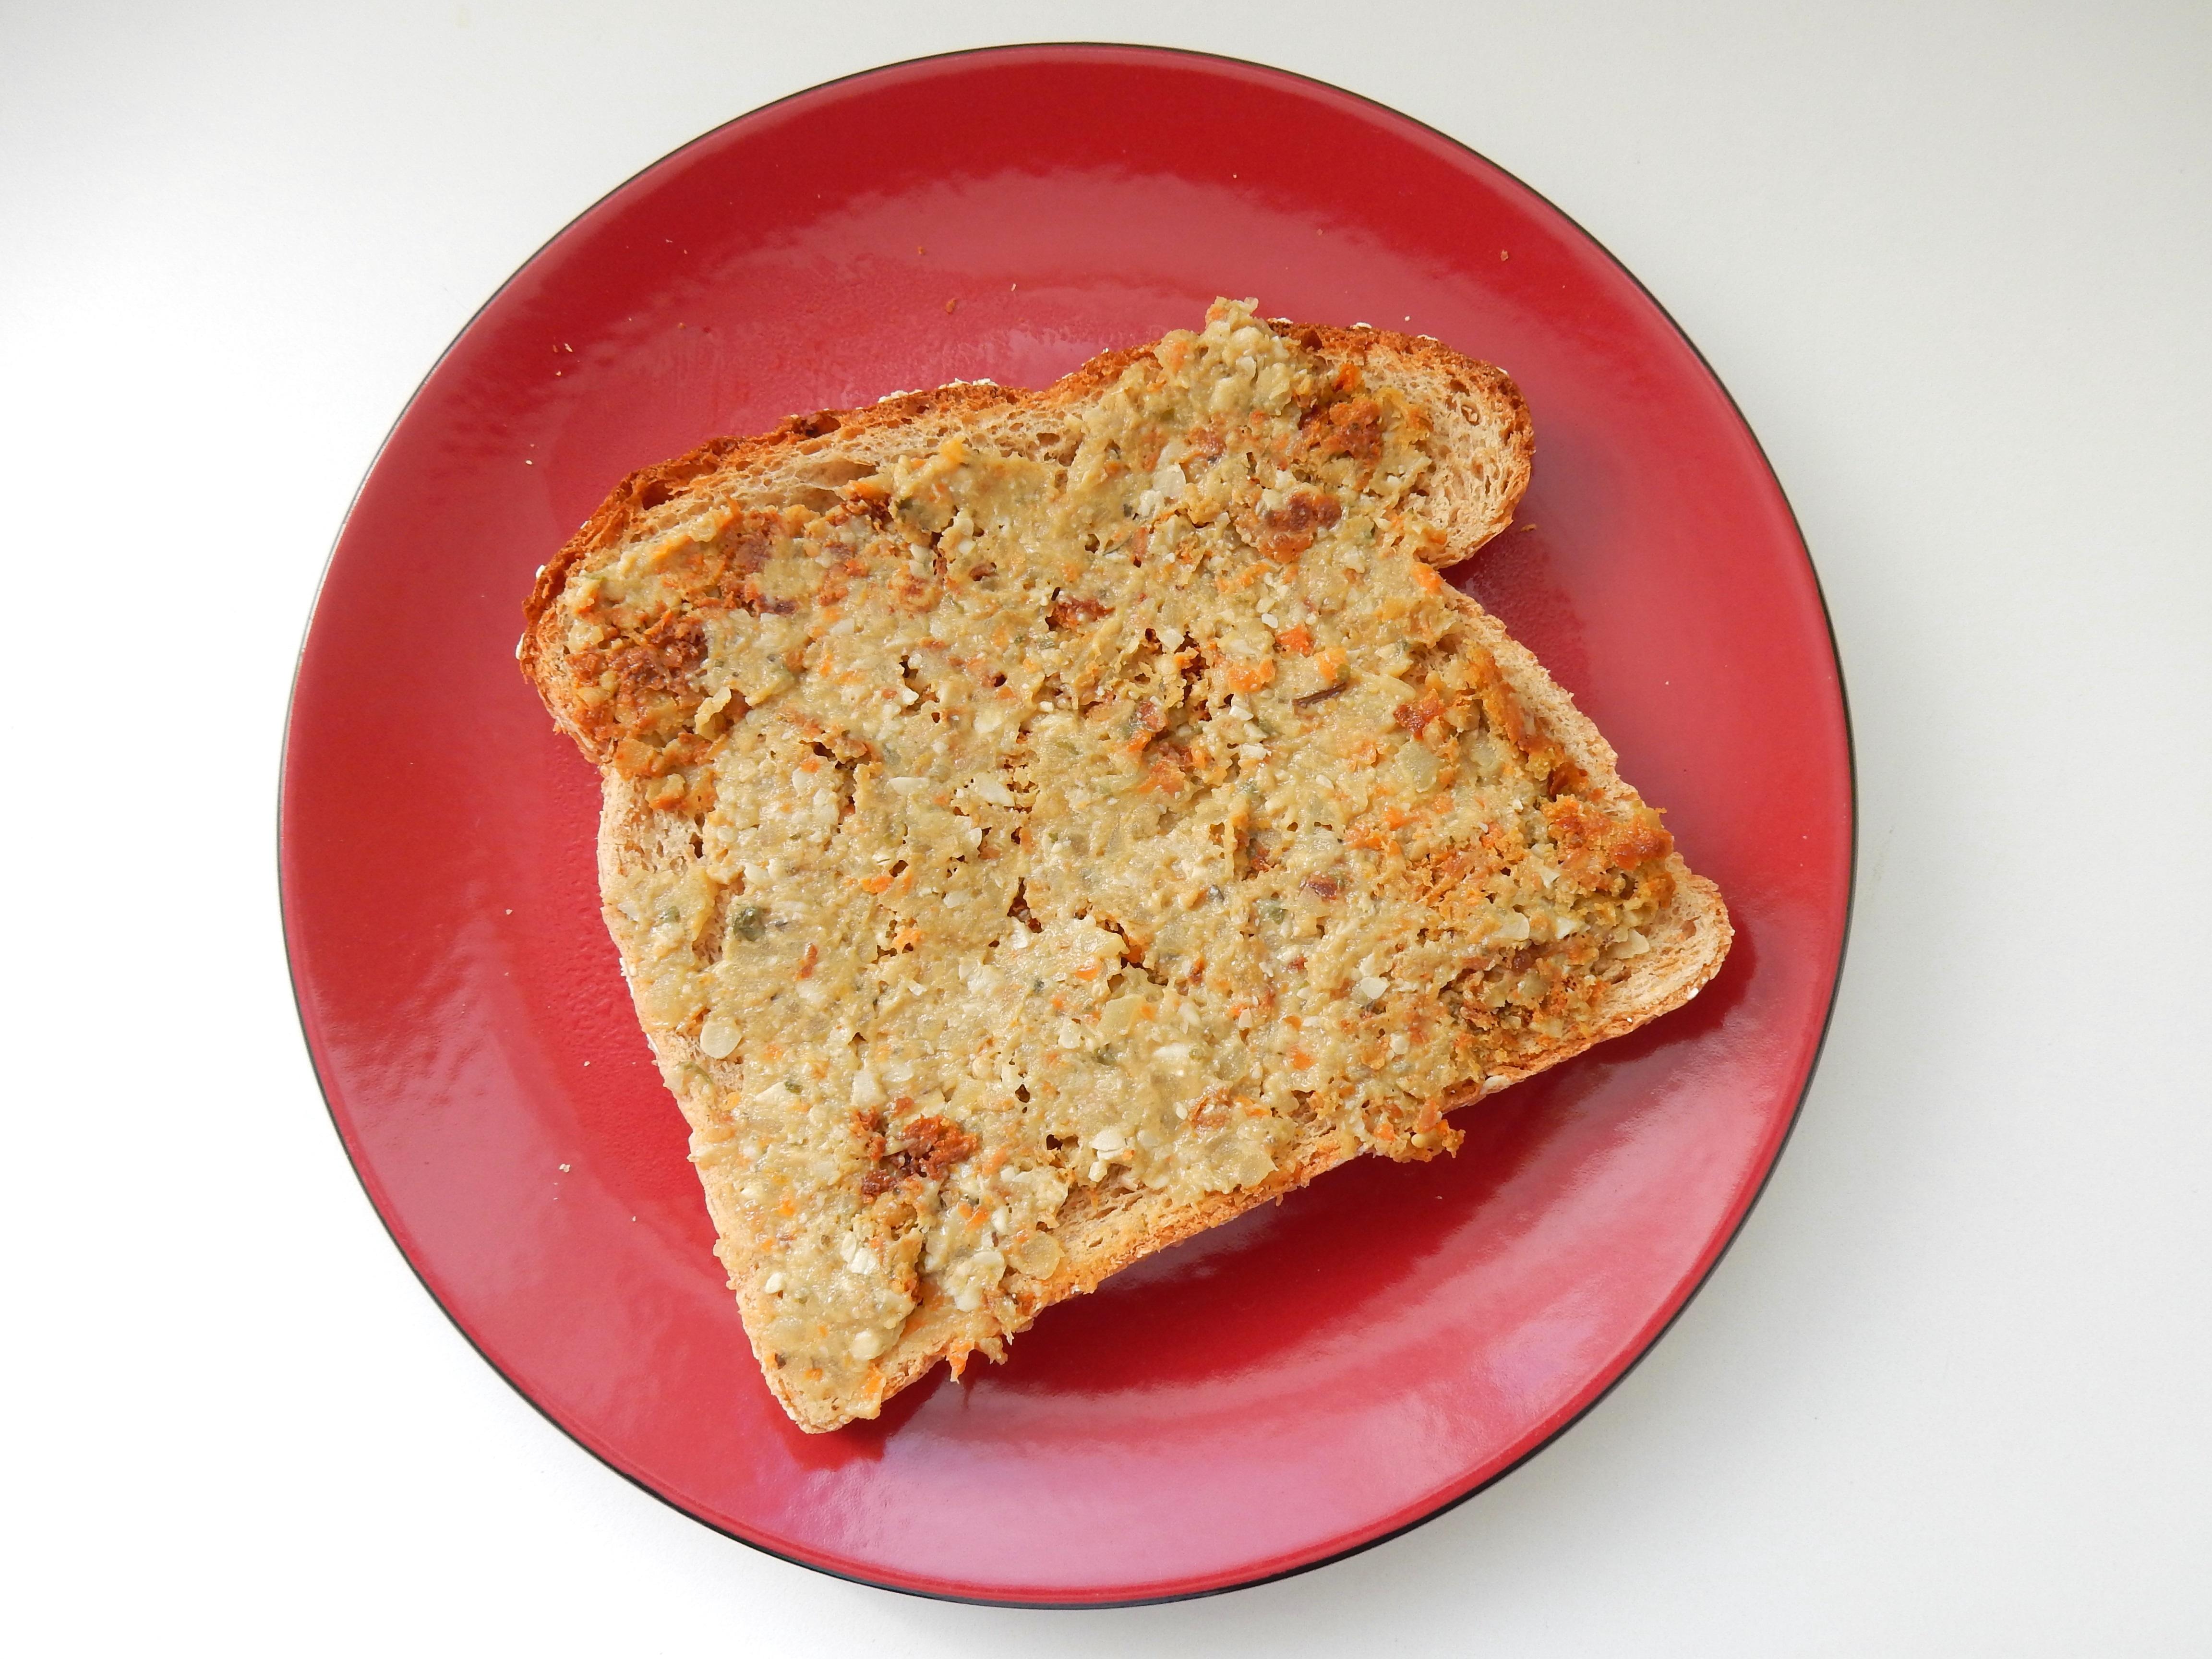 Sur toast